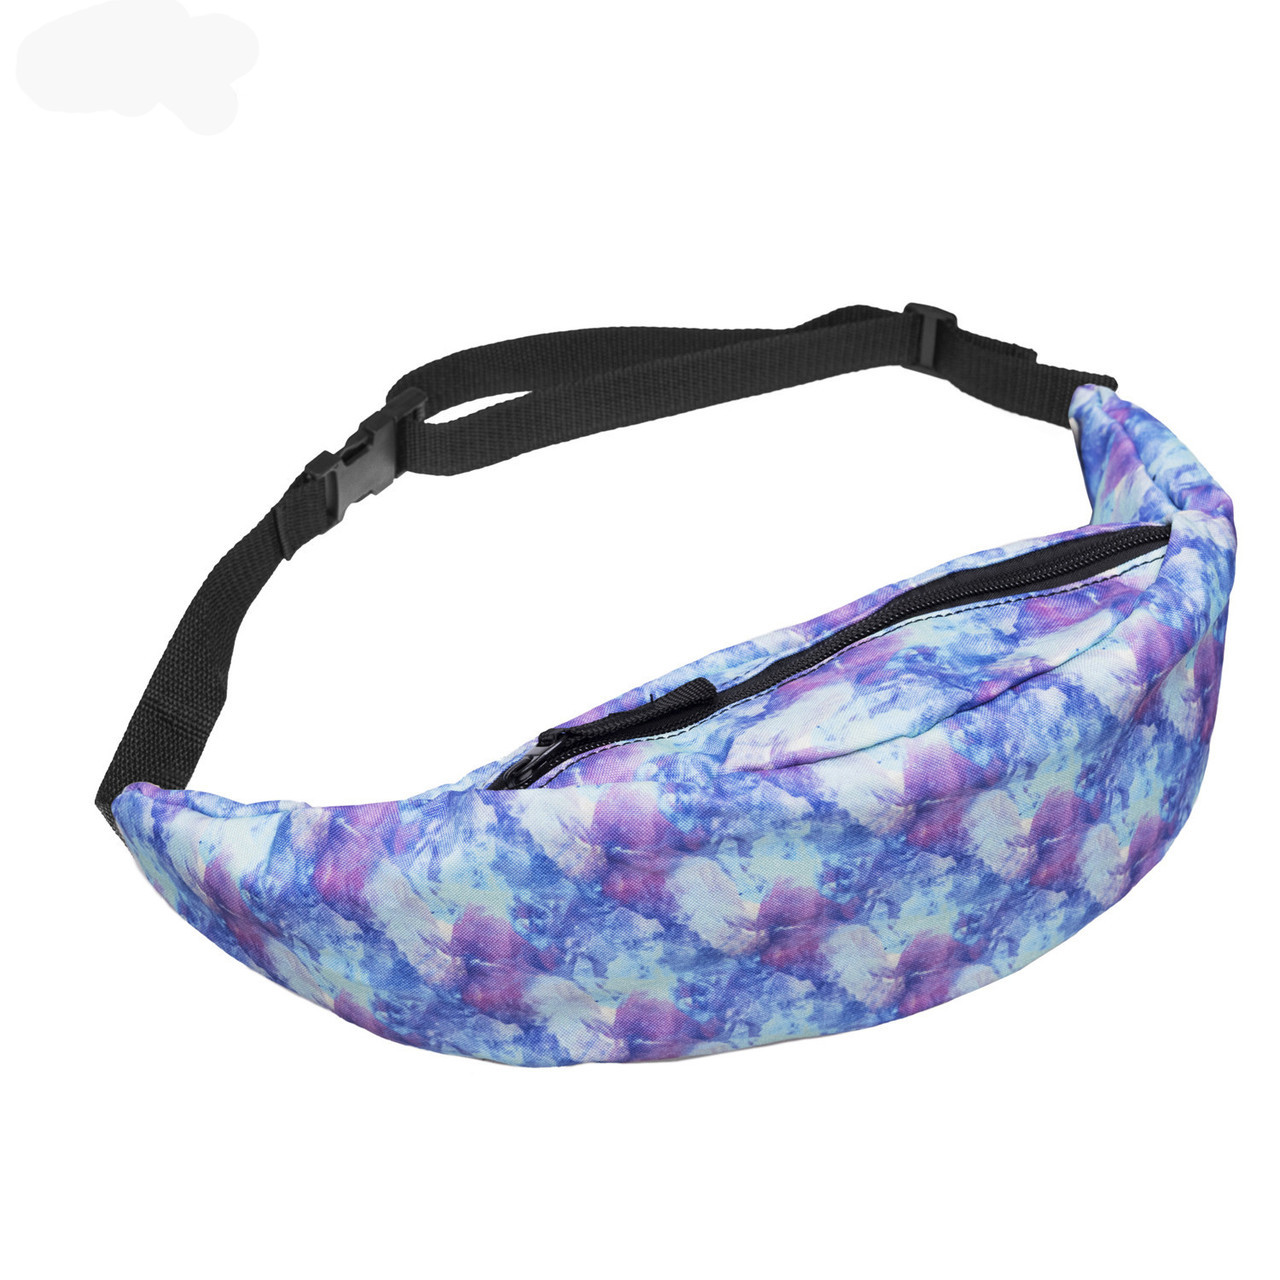 Поясная сумка в стиле Zohra Фиолетовые Облака, фото 1